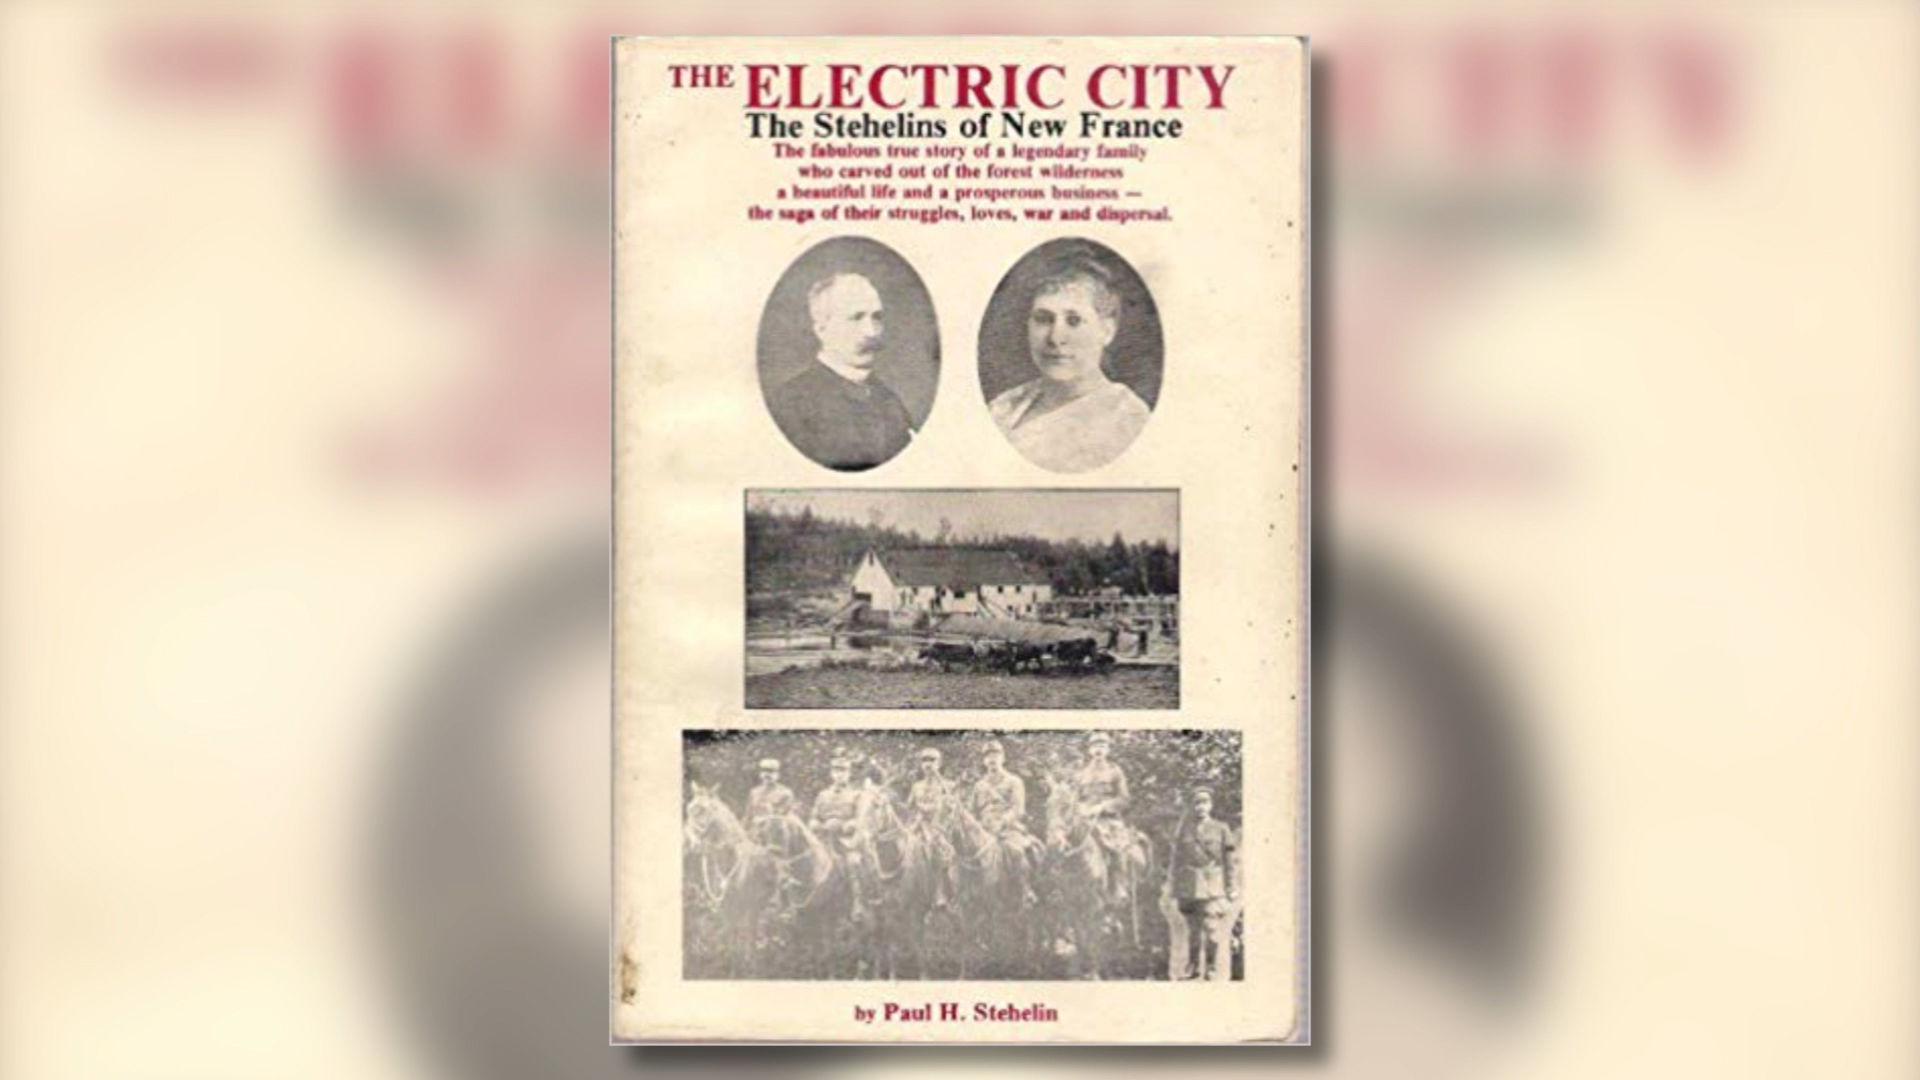 NOVA SCOTIA Travel Special - NEW FRANCE: the Electric City